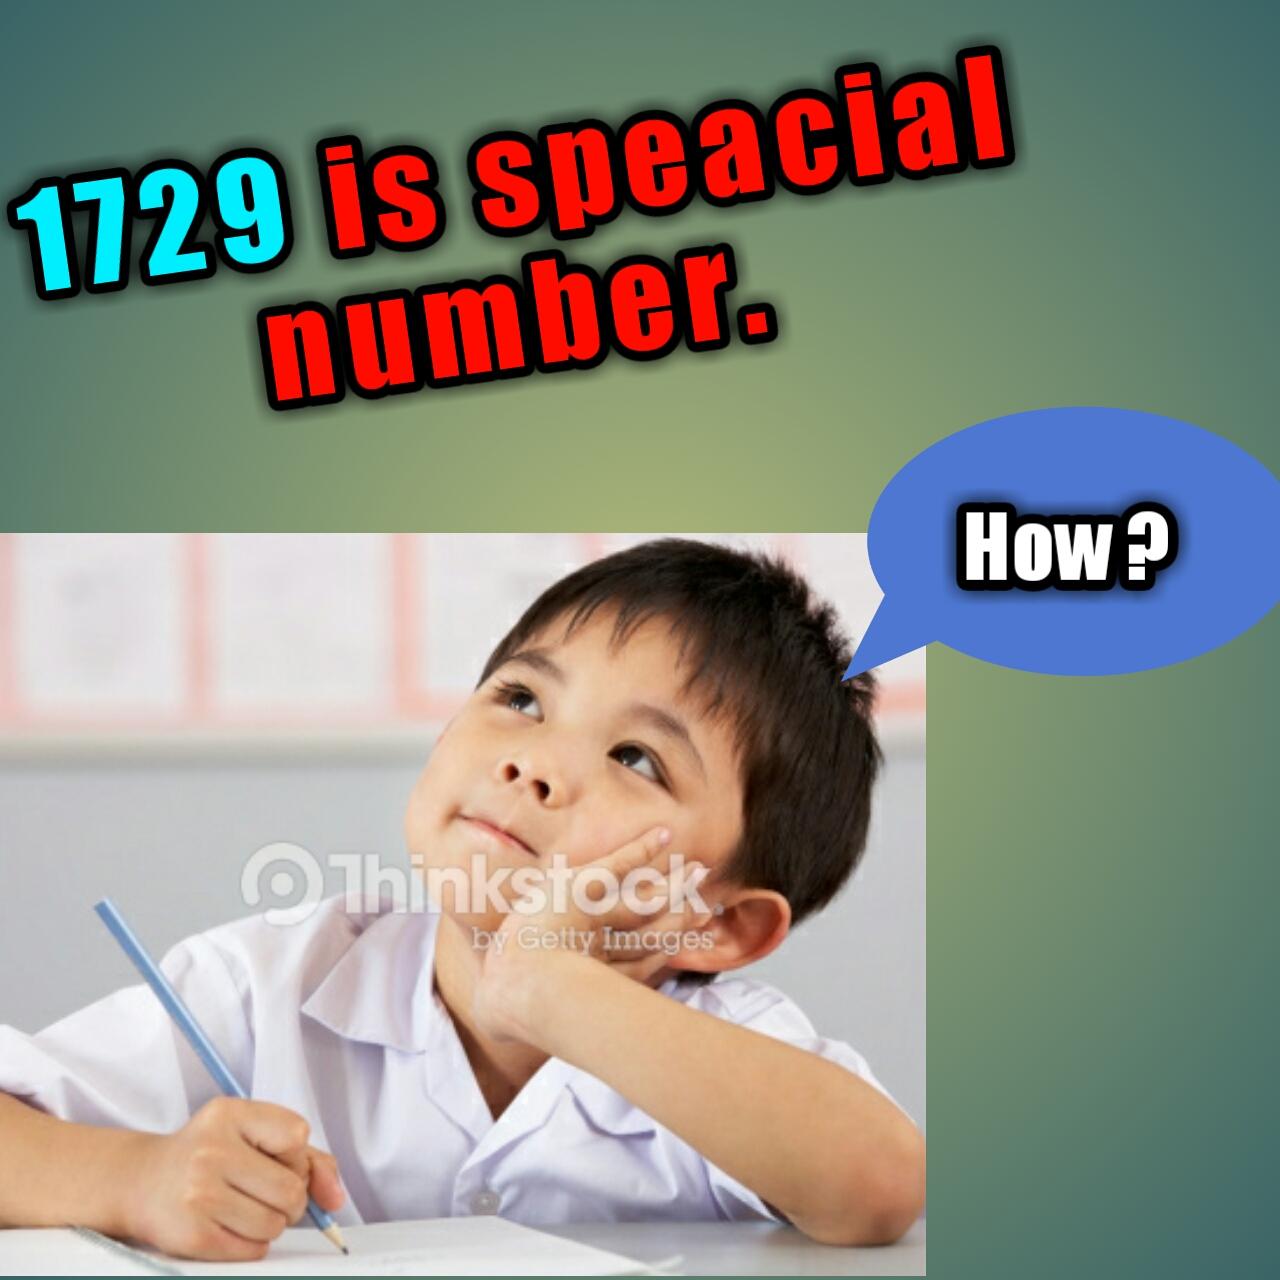 Is 1729